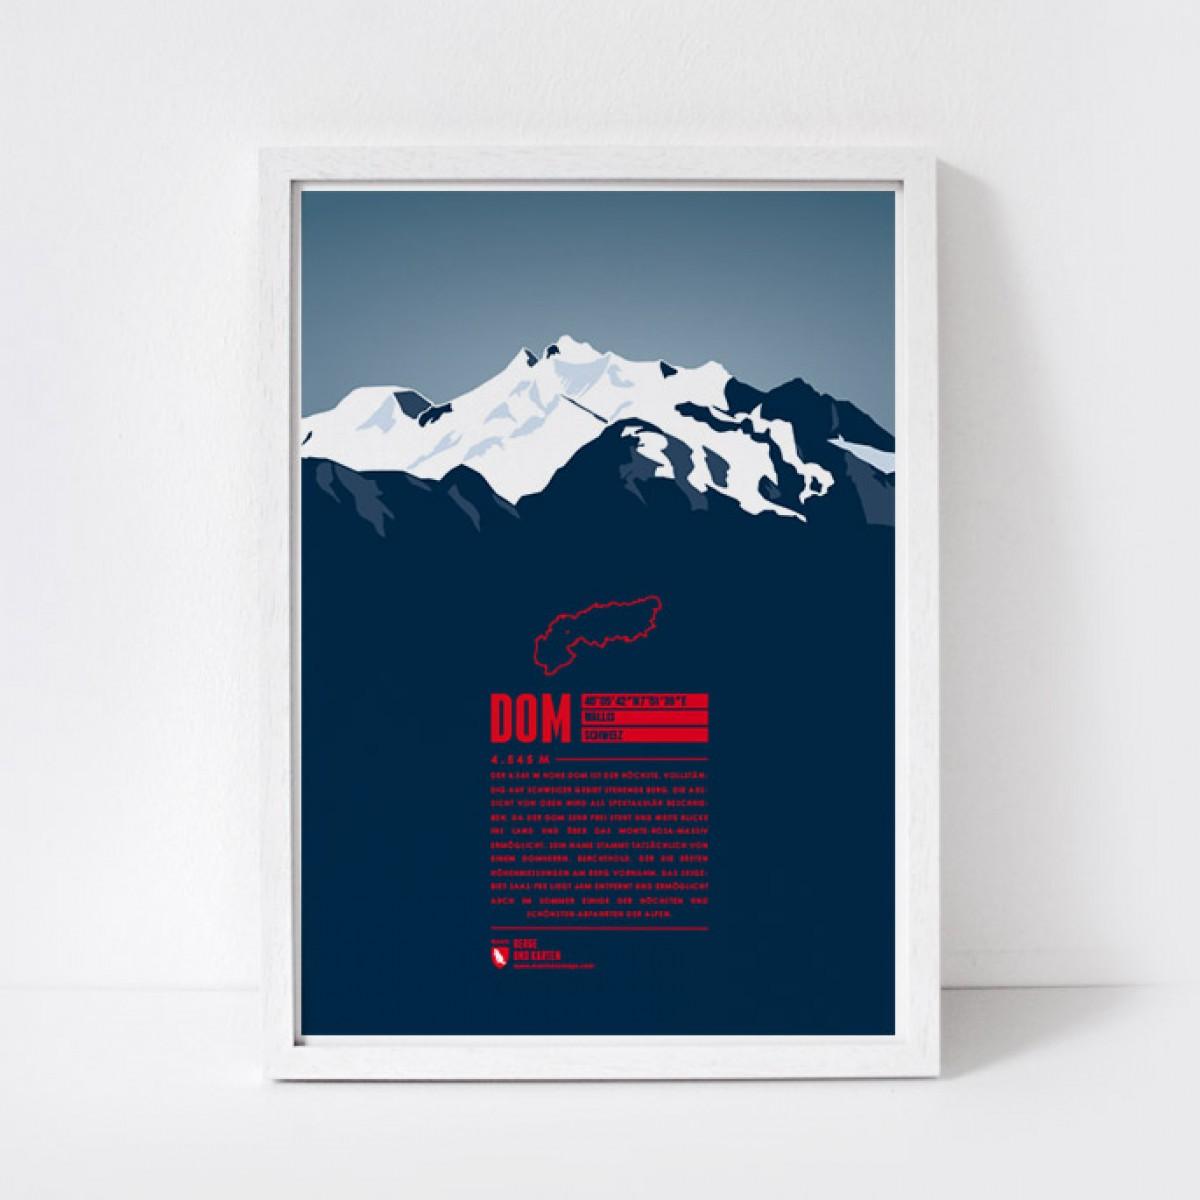 Marmota Maps – Dom - Bergdruck